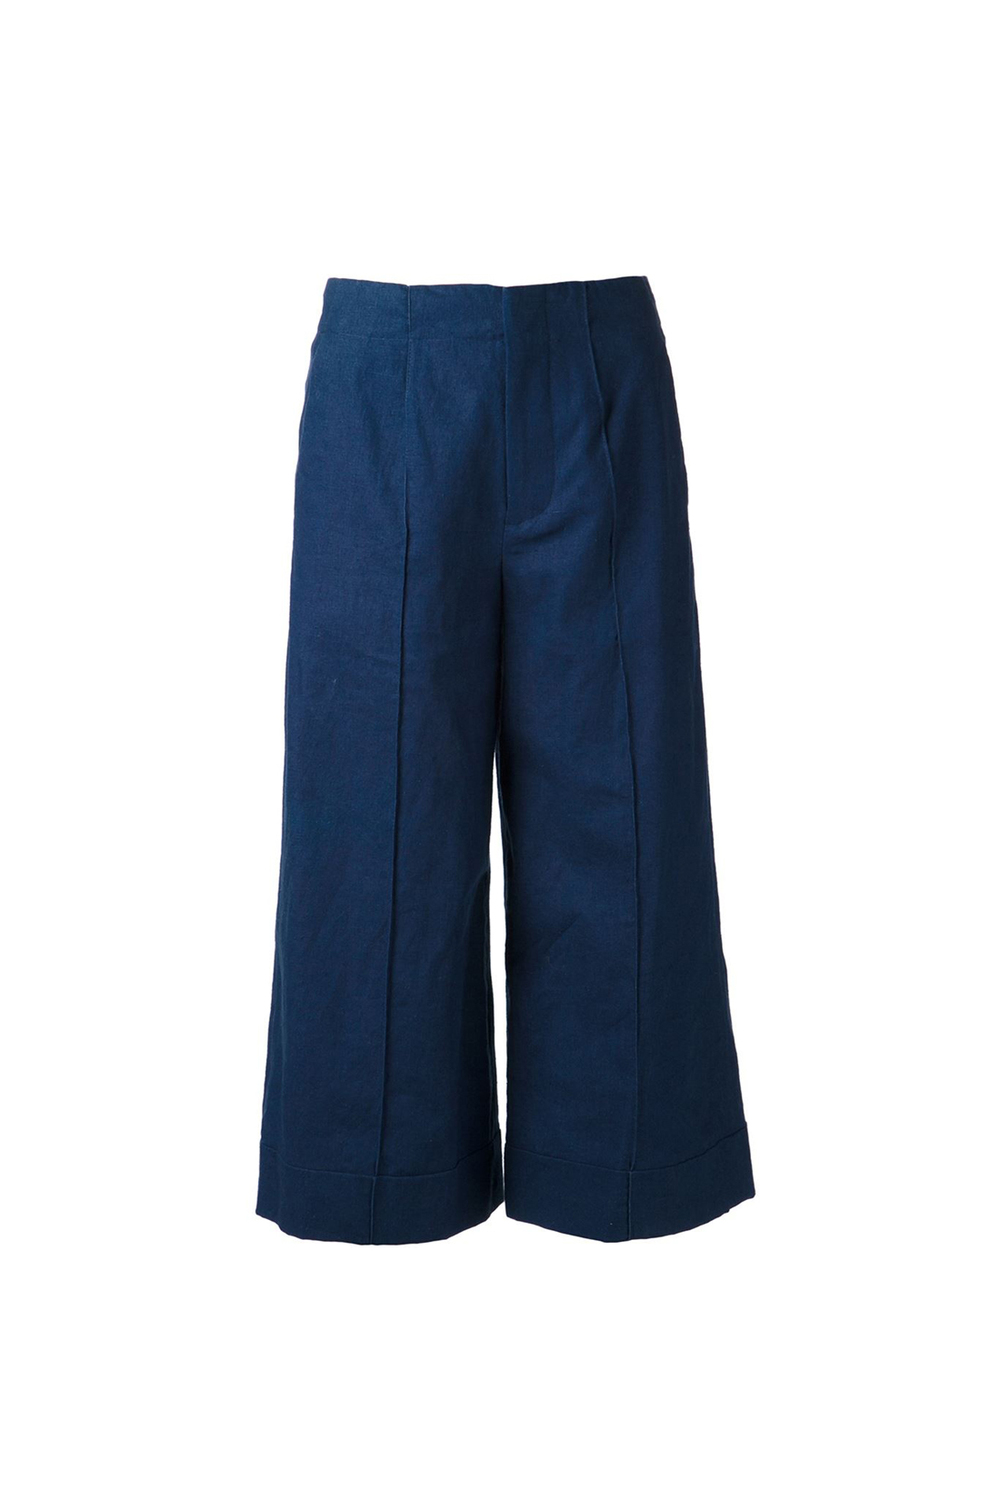 02-spring-denim-trends-culottes-02-1.jpg